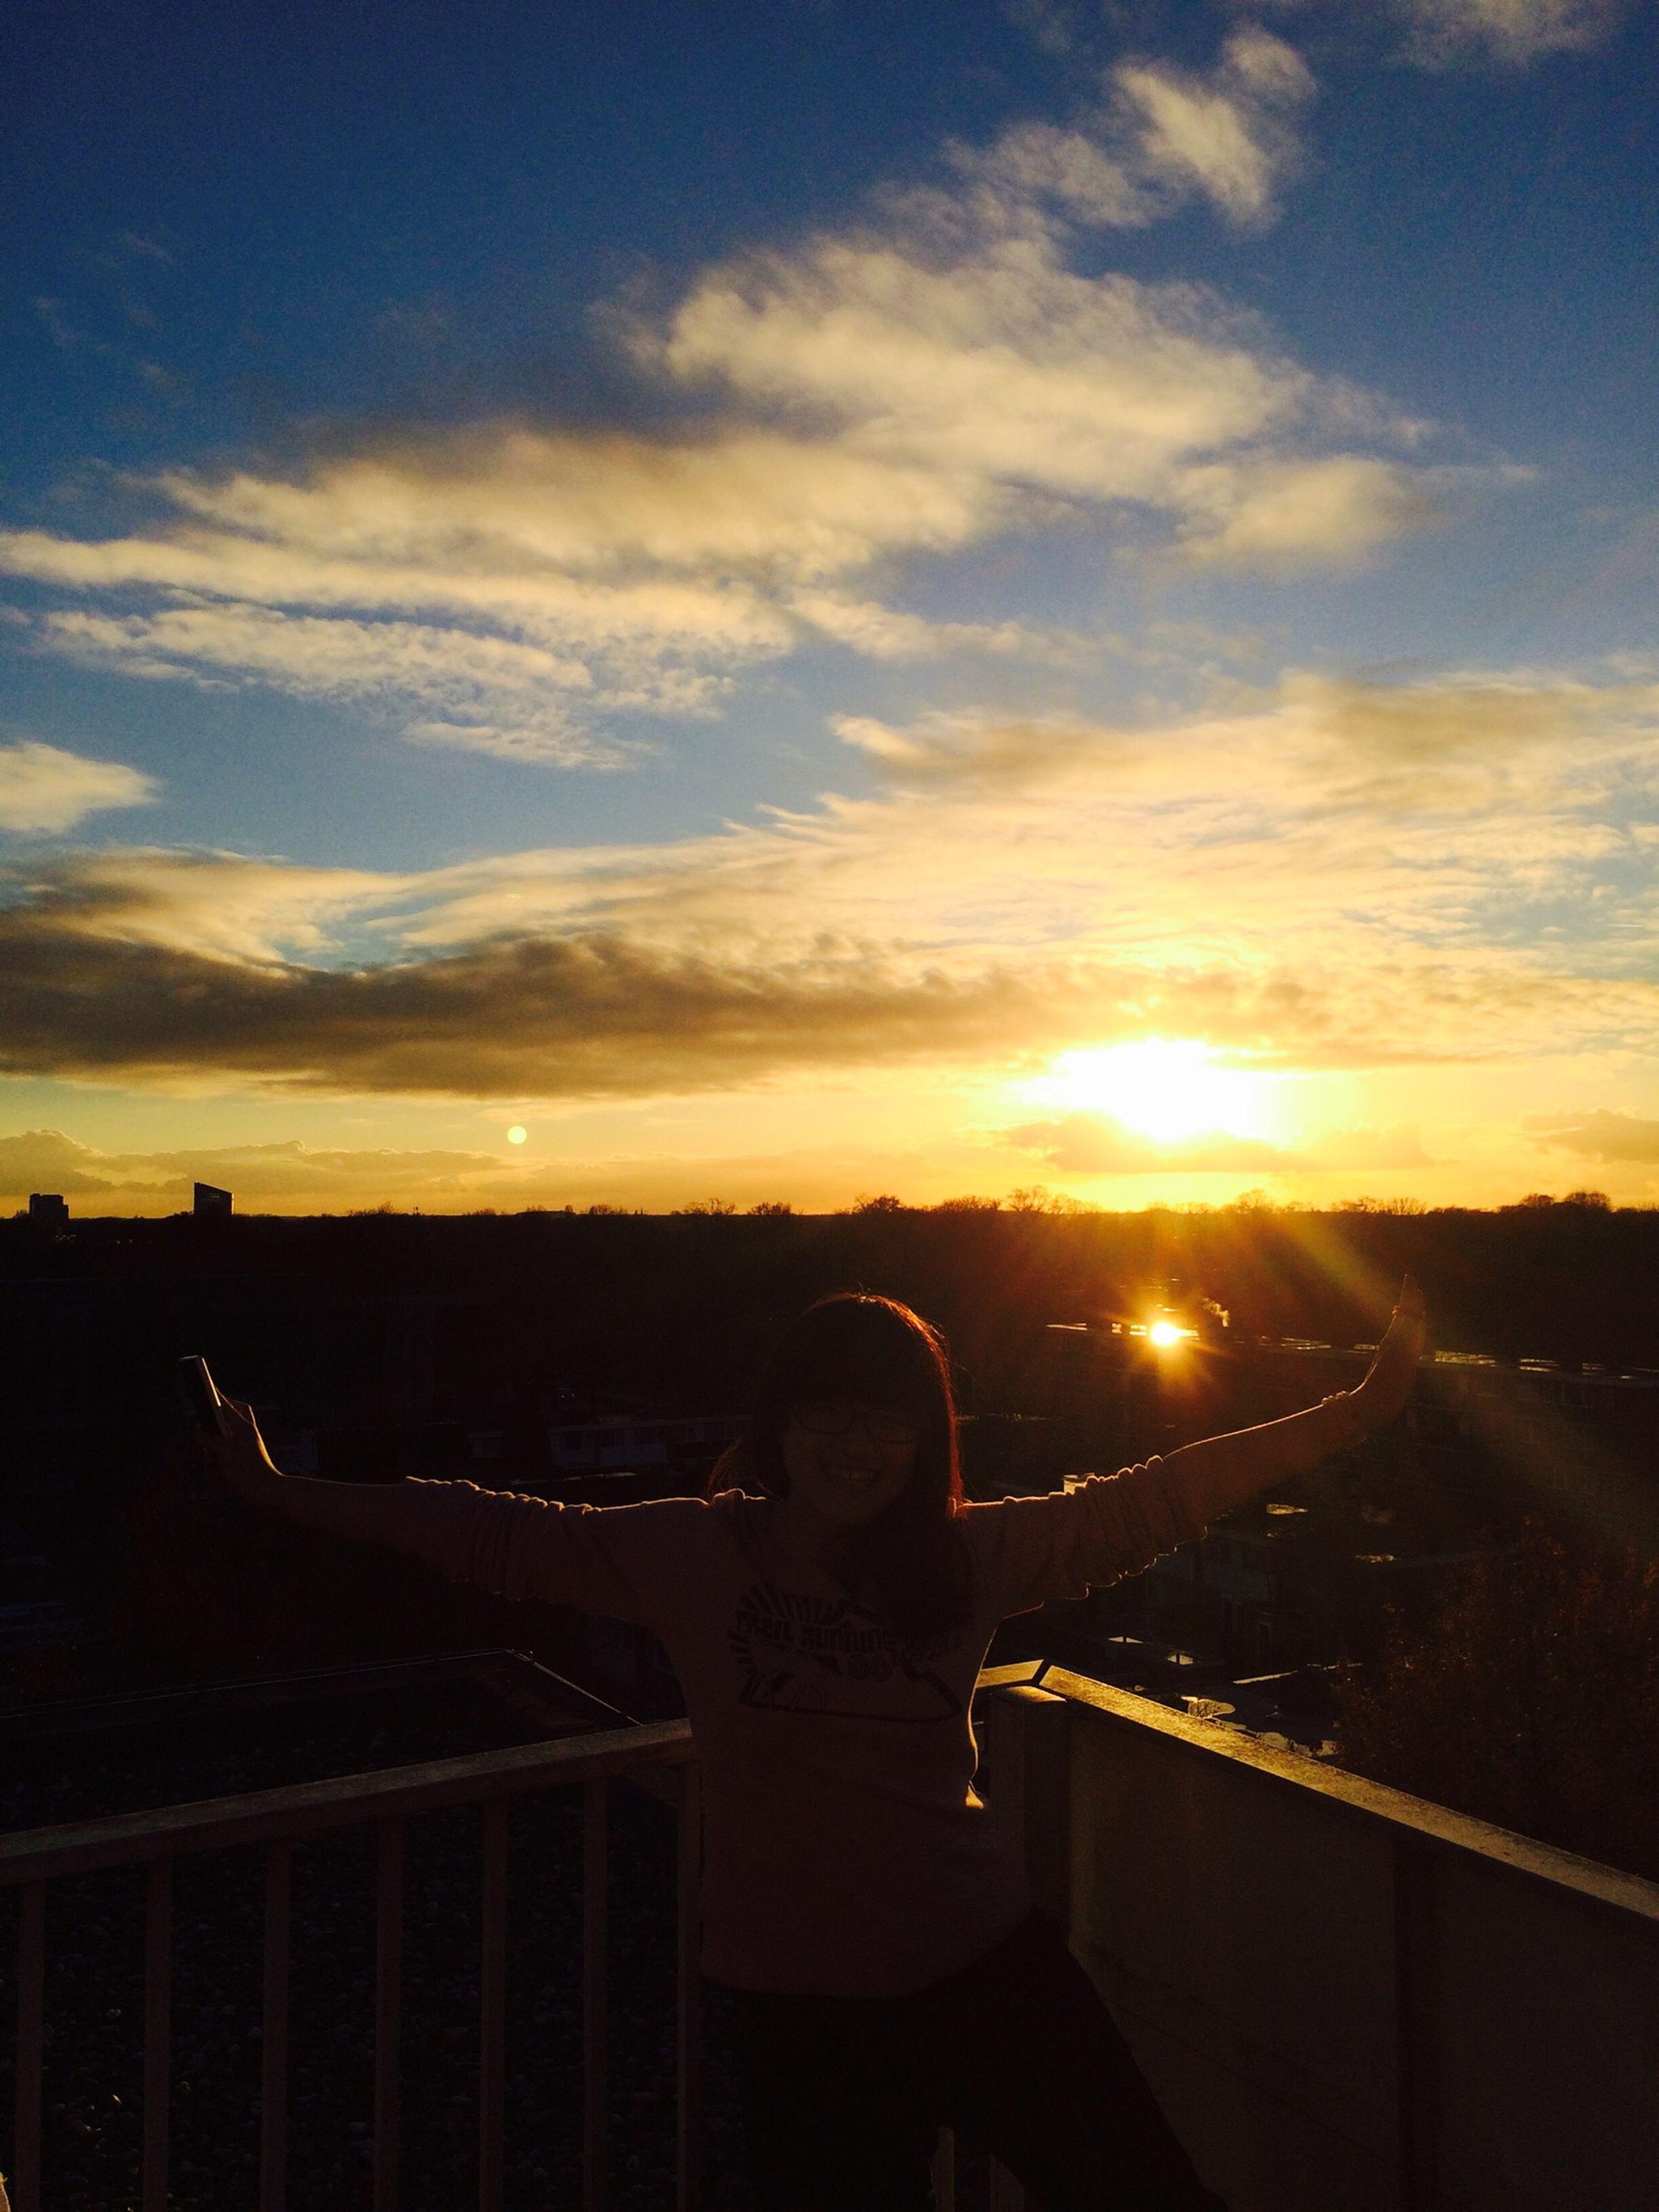 sunset, sky, cloud - sky, transportation, land vehicle, building exterior, mode of transport, built structure, car, architecture, cloud, orange color, silhouette, sun, cloudy, dusk, no people, nature, outdoors, sunlight